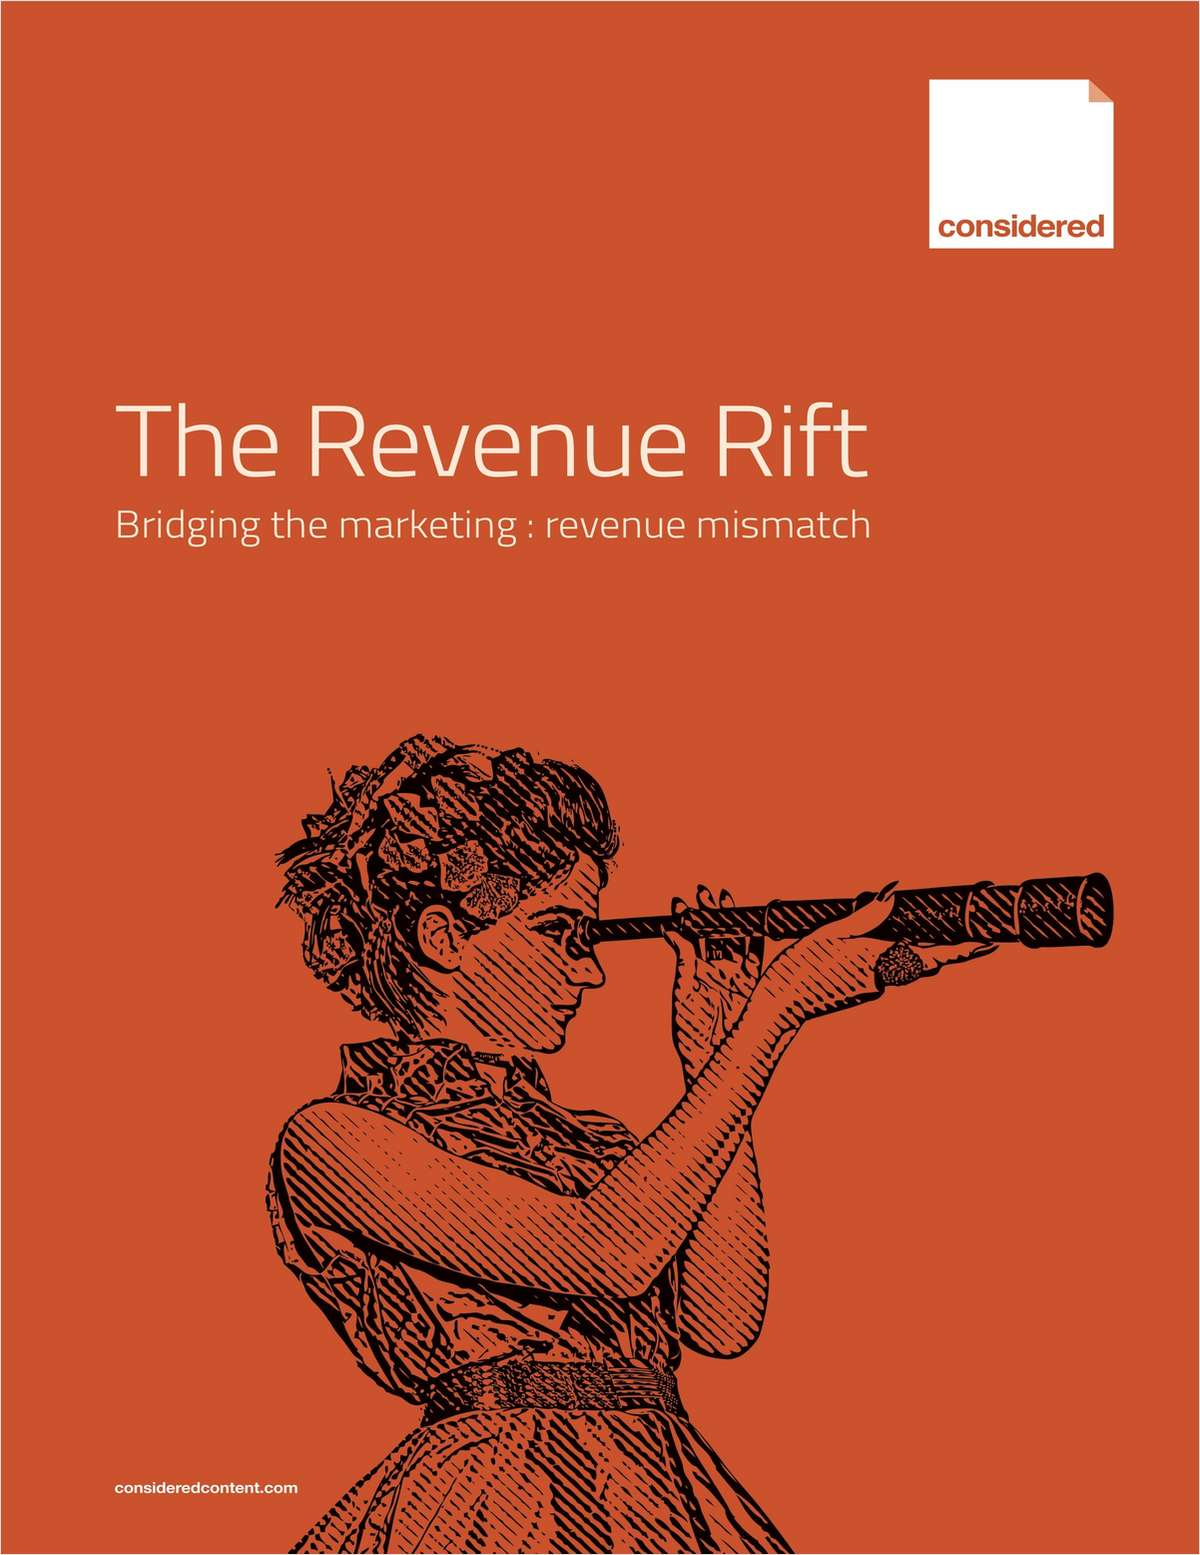 The Revenue Rift Report--Bridging the Marketing : Revenue Mismatch